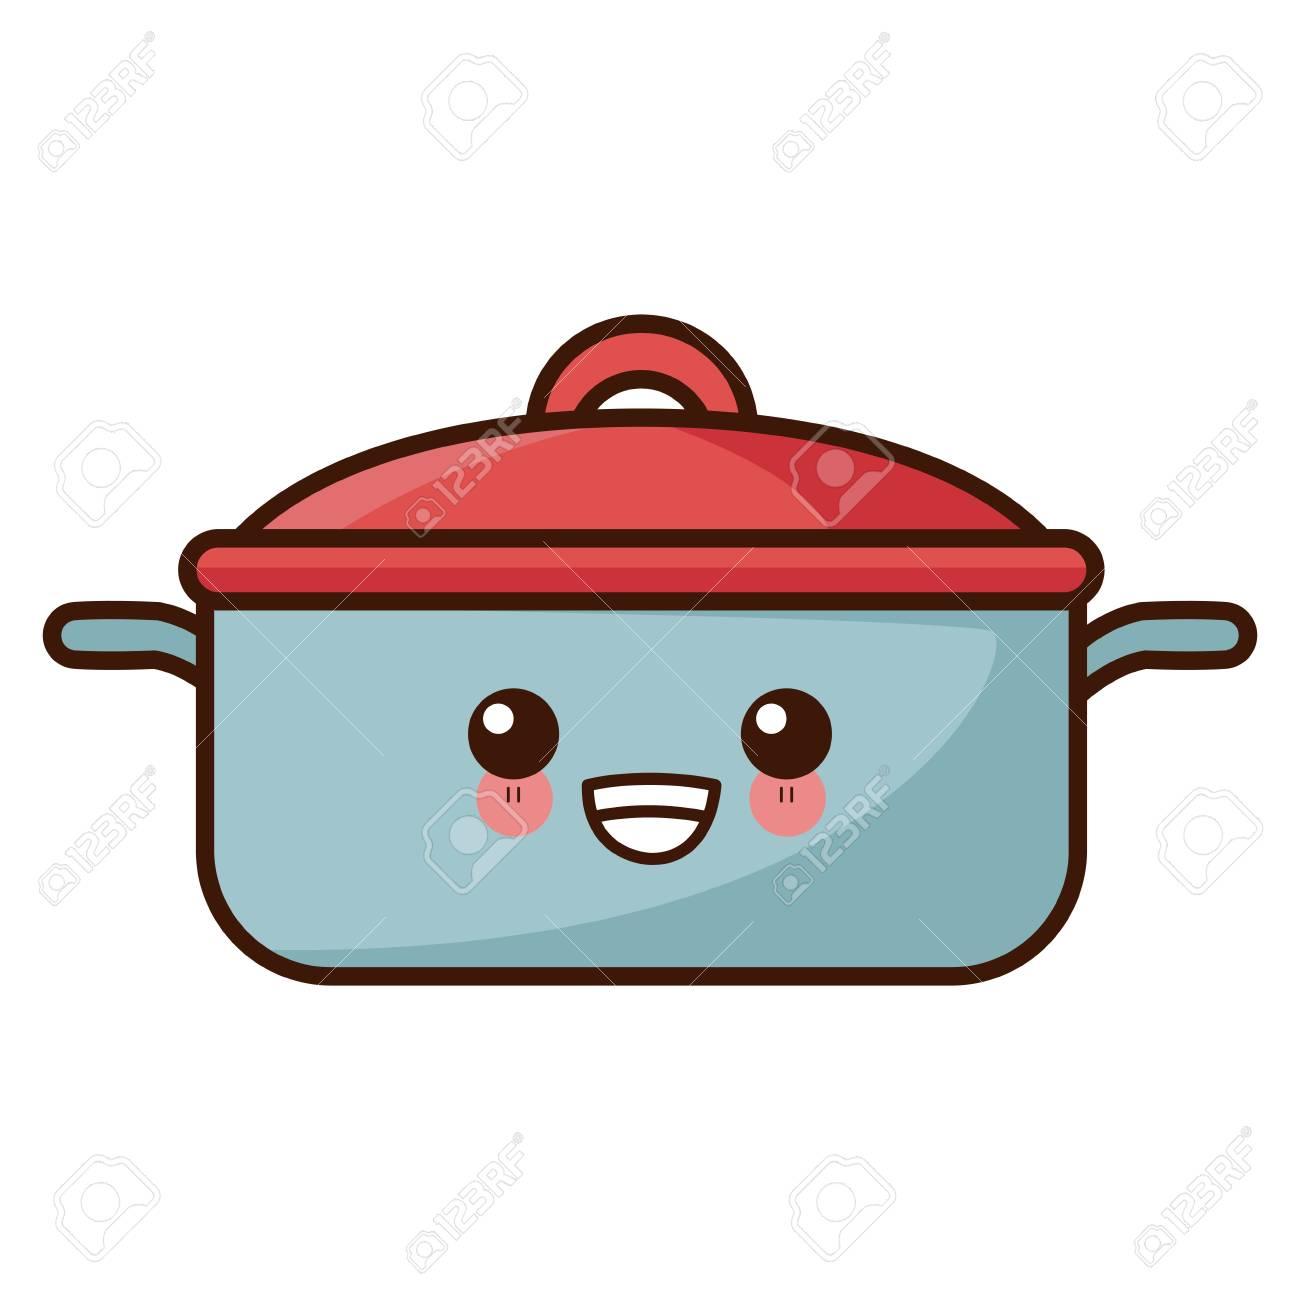 Pot Kitchen Utensil Cute Cartoon Illustration Royalty Free Cliparts Vectors And Stock Illustration Image 88234374